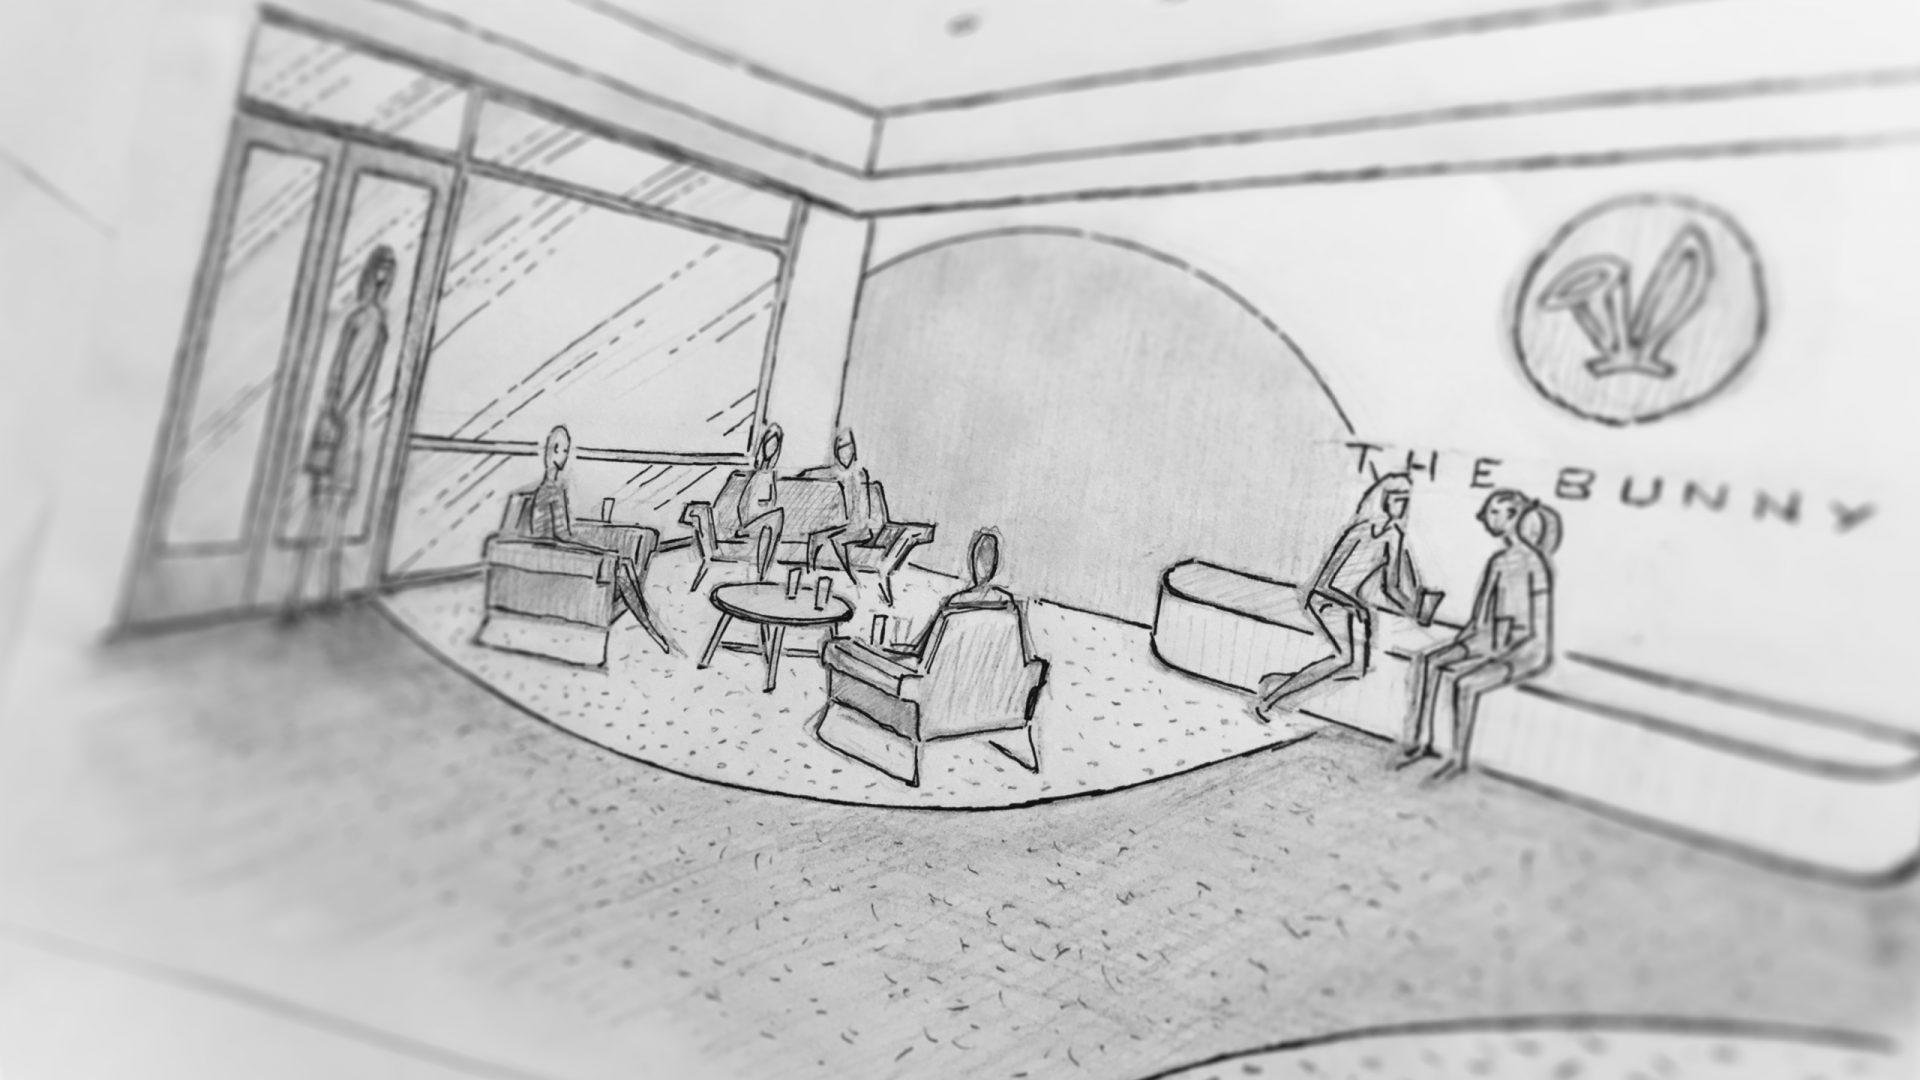 The Bunny Bubble Tea Store interior design sketch – front seating area area